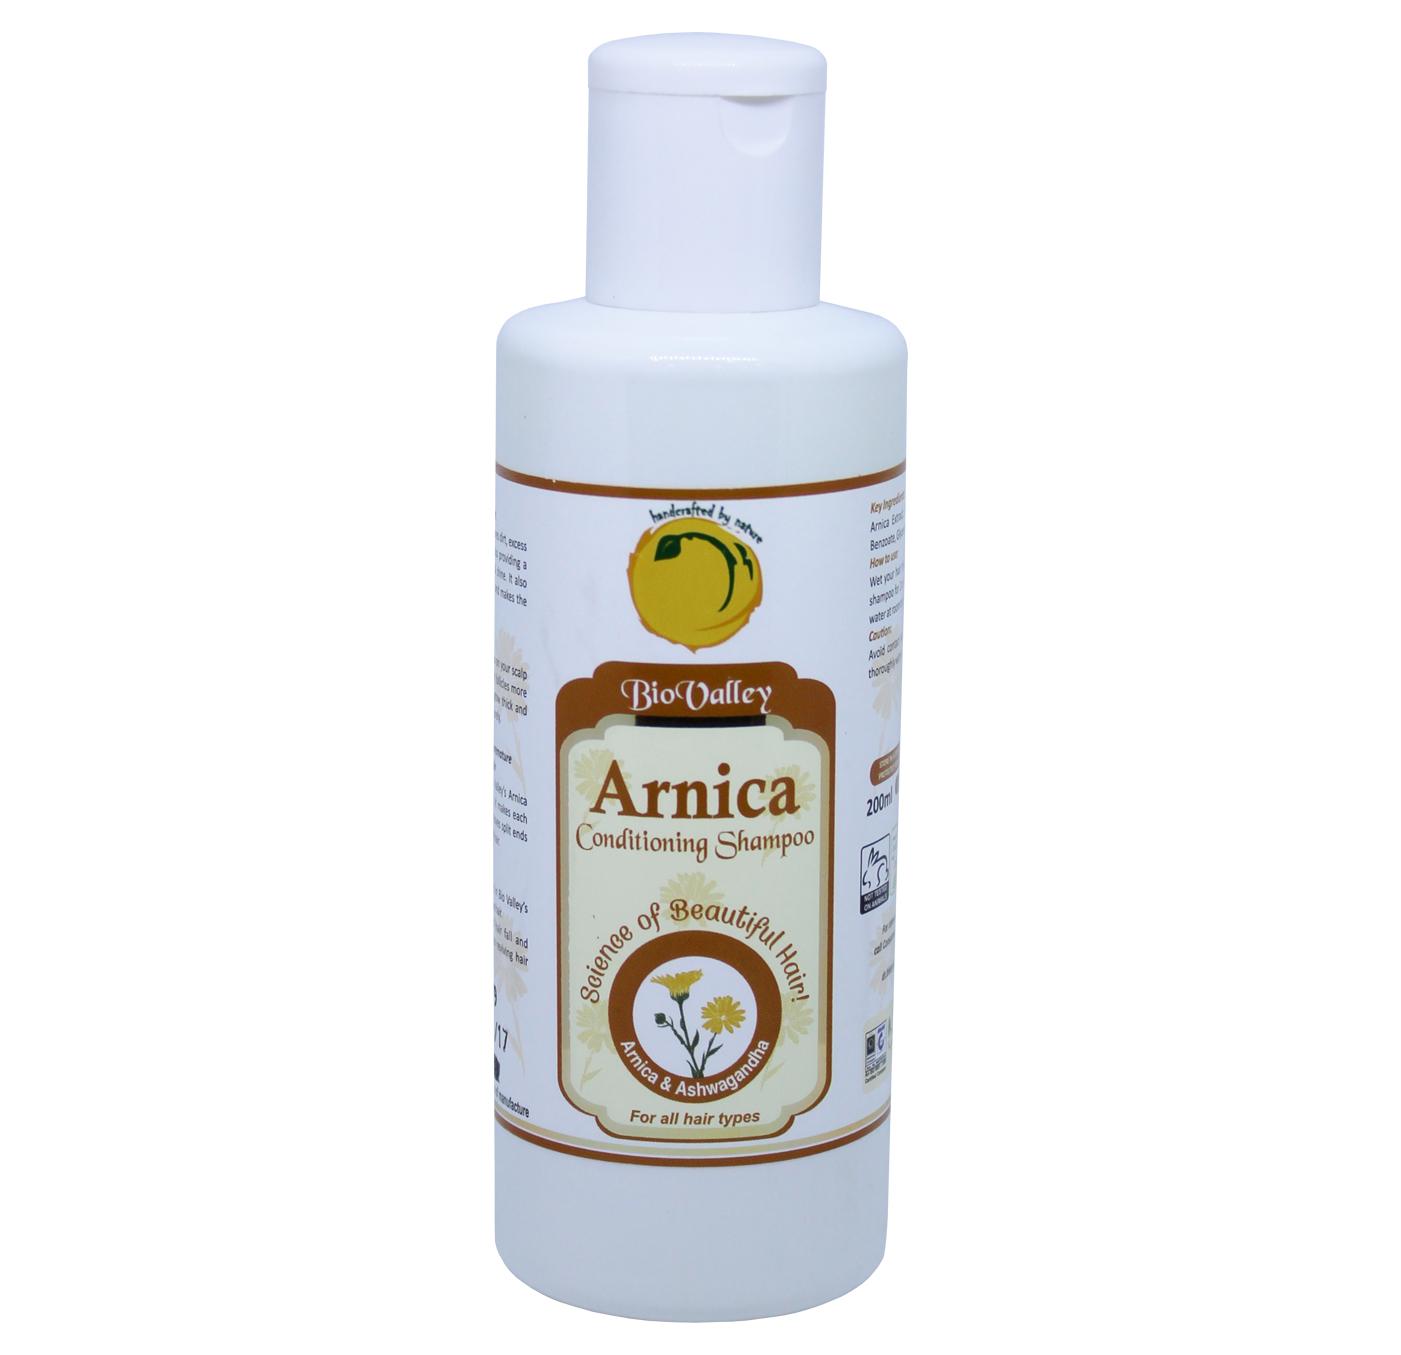 Arnica Shampoo Nourishes The Hair Follicles style=